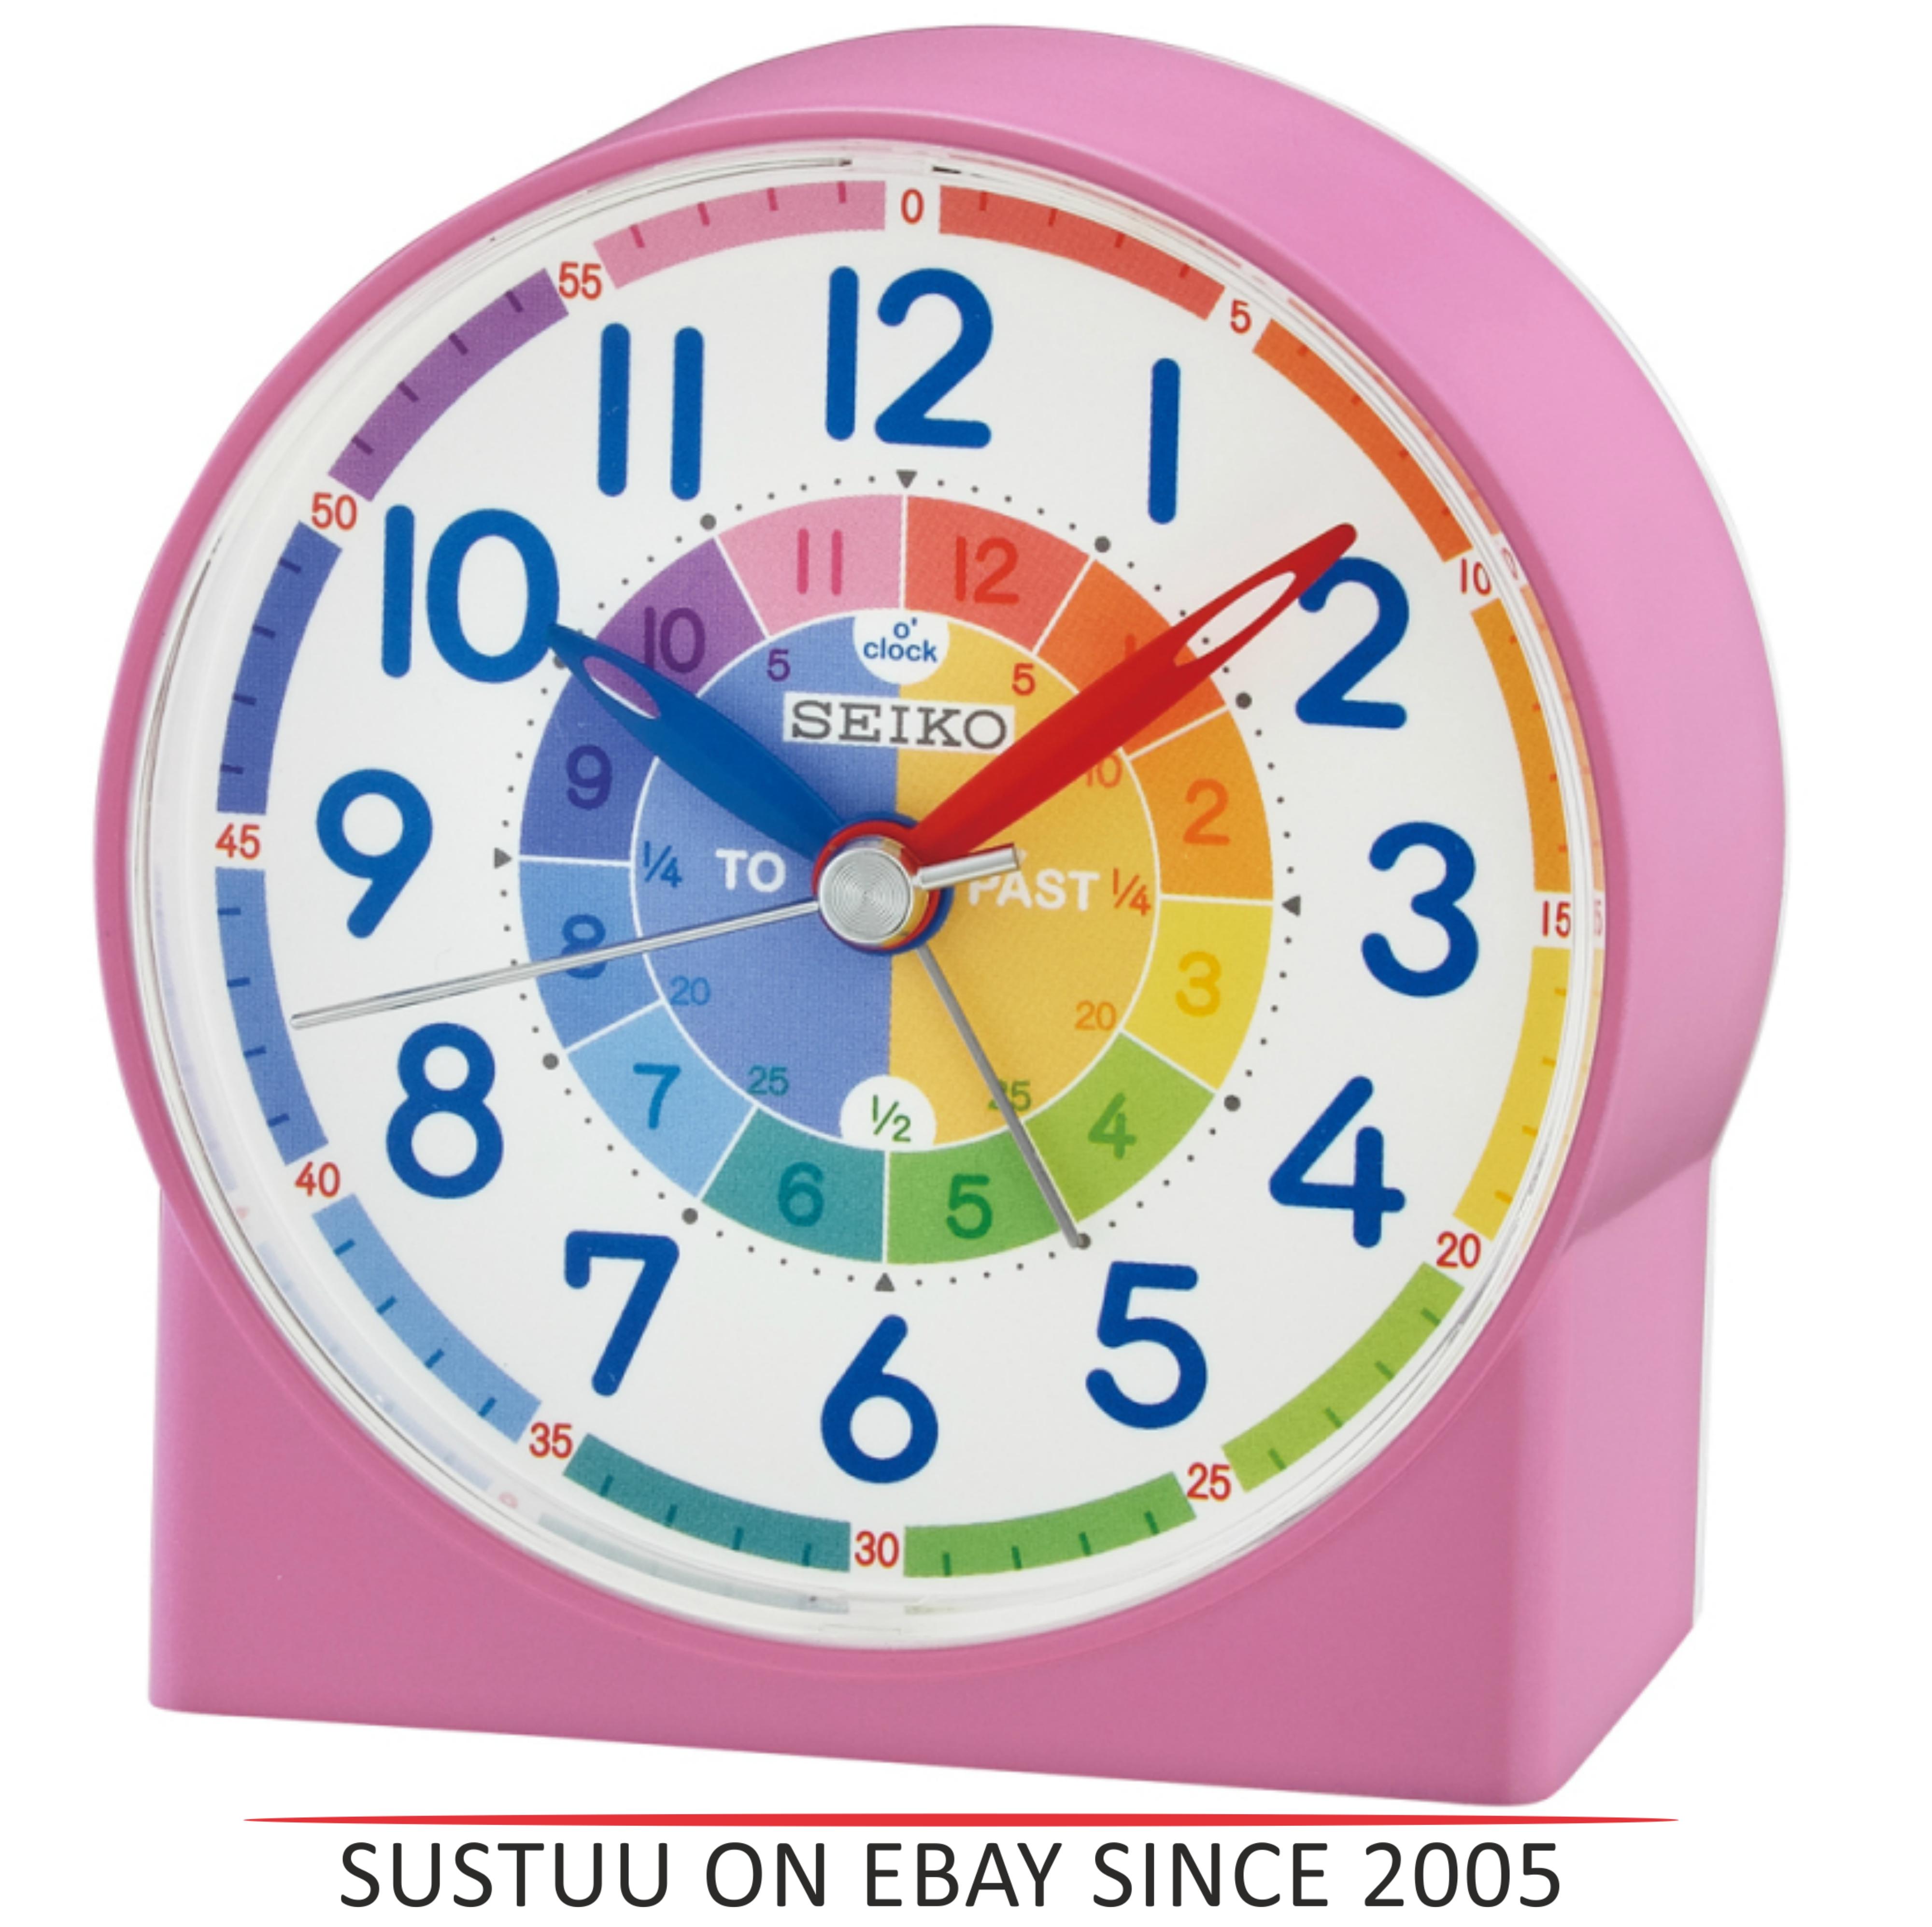 Seiko QHE153P Childrens Time Teaching Alarm Clock|Kids Bedroom Clock - Pink